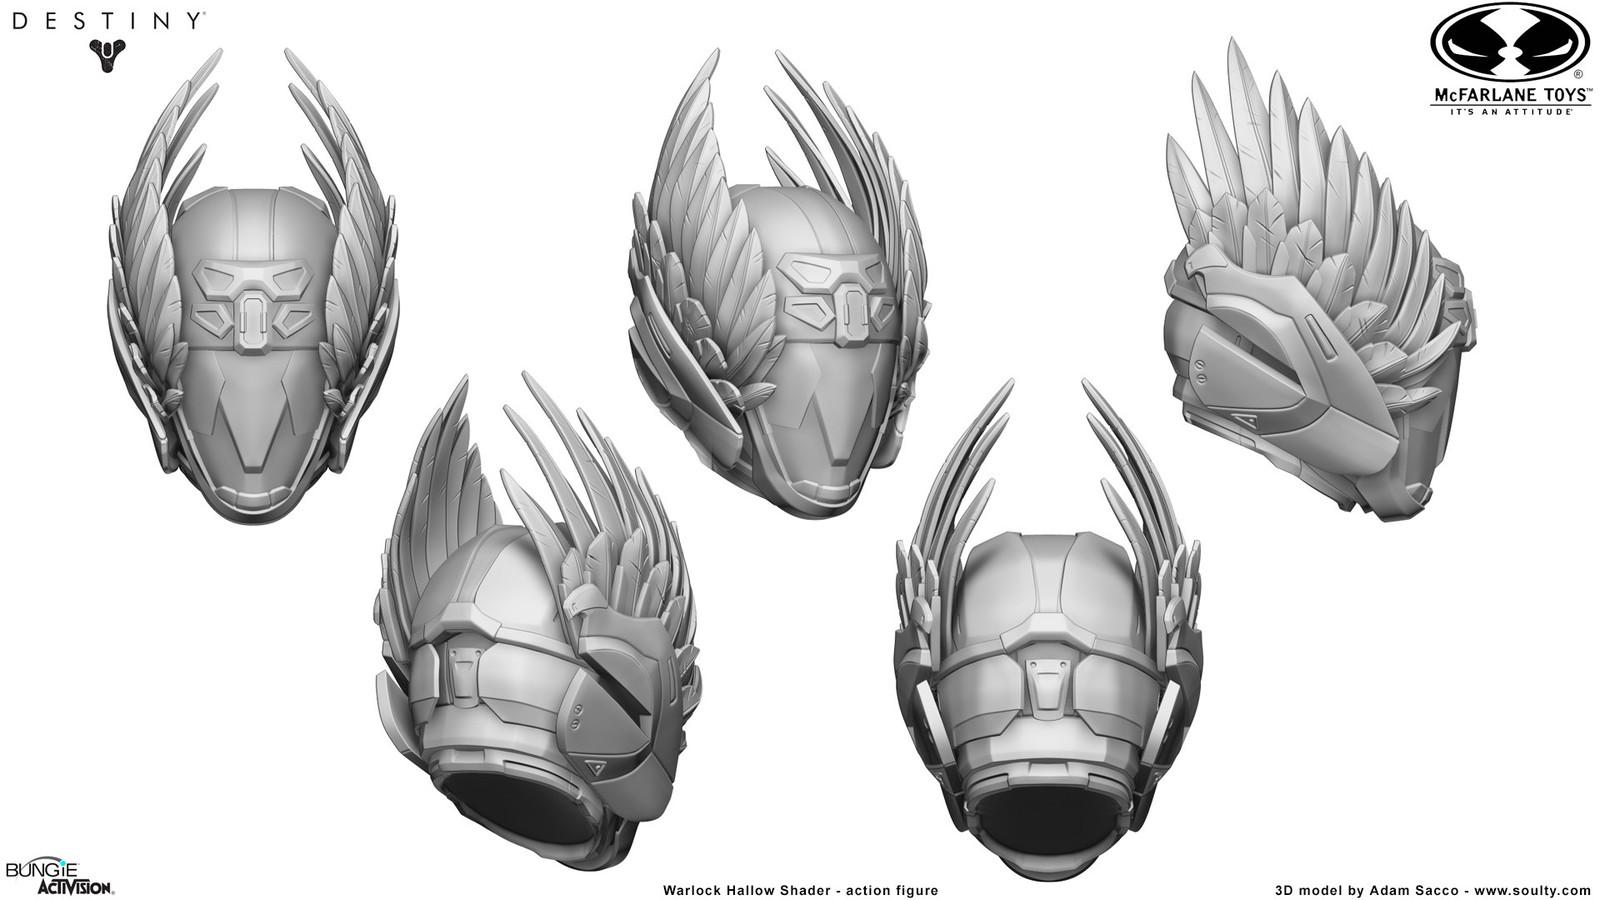 3D Model _ Mcfarlane Toys - Destiny: Warlock Hallow Beyond Nemesis - Action figure